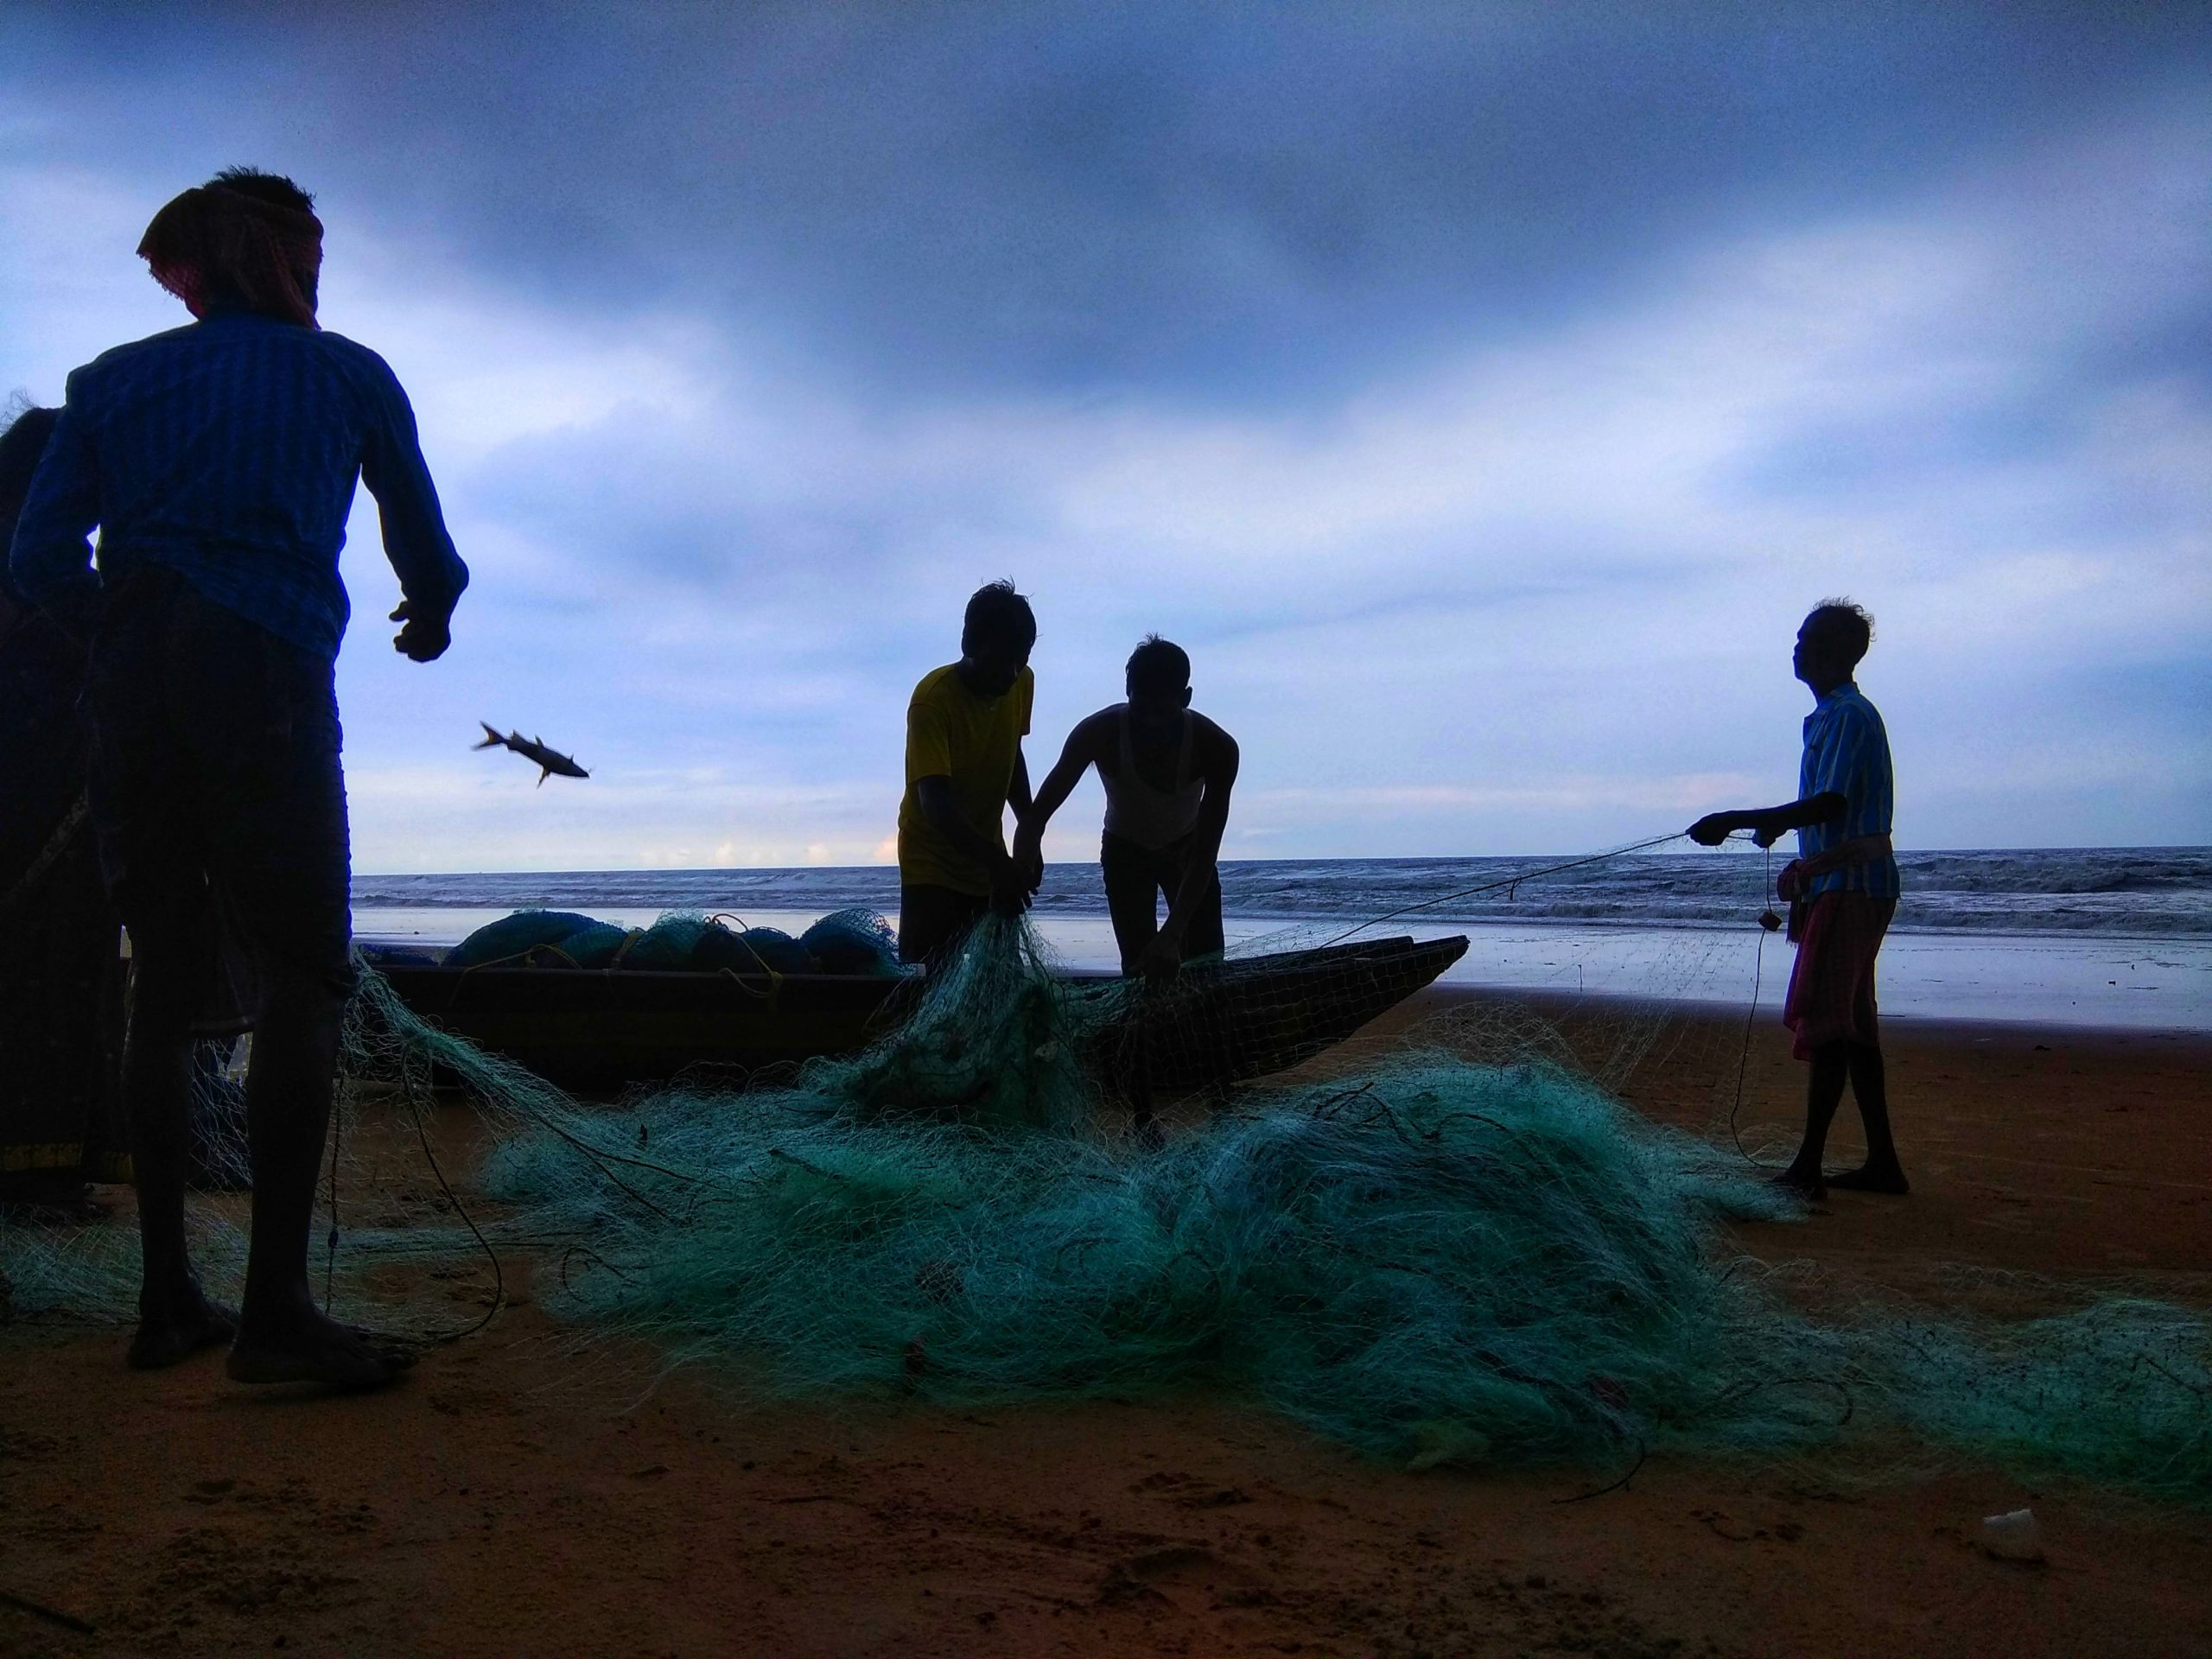 Fishermen arranging net